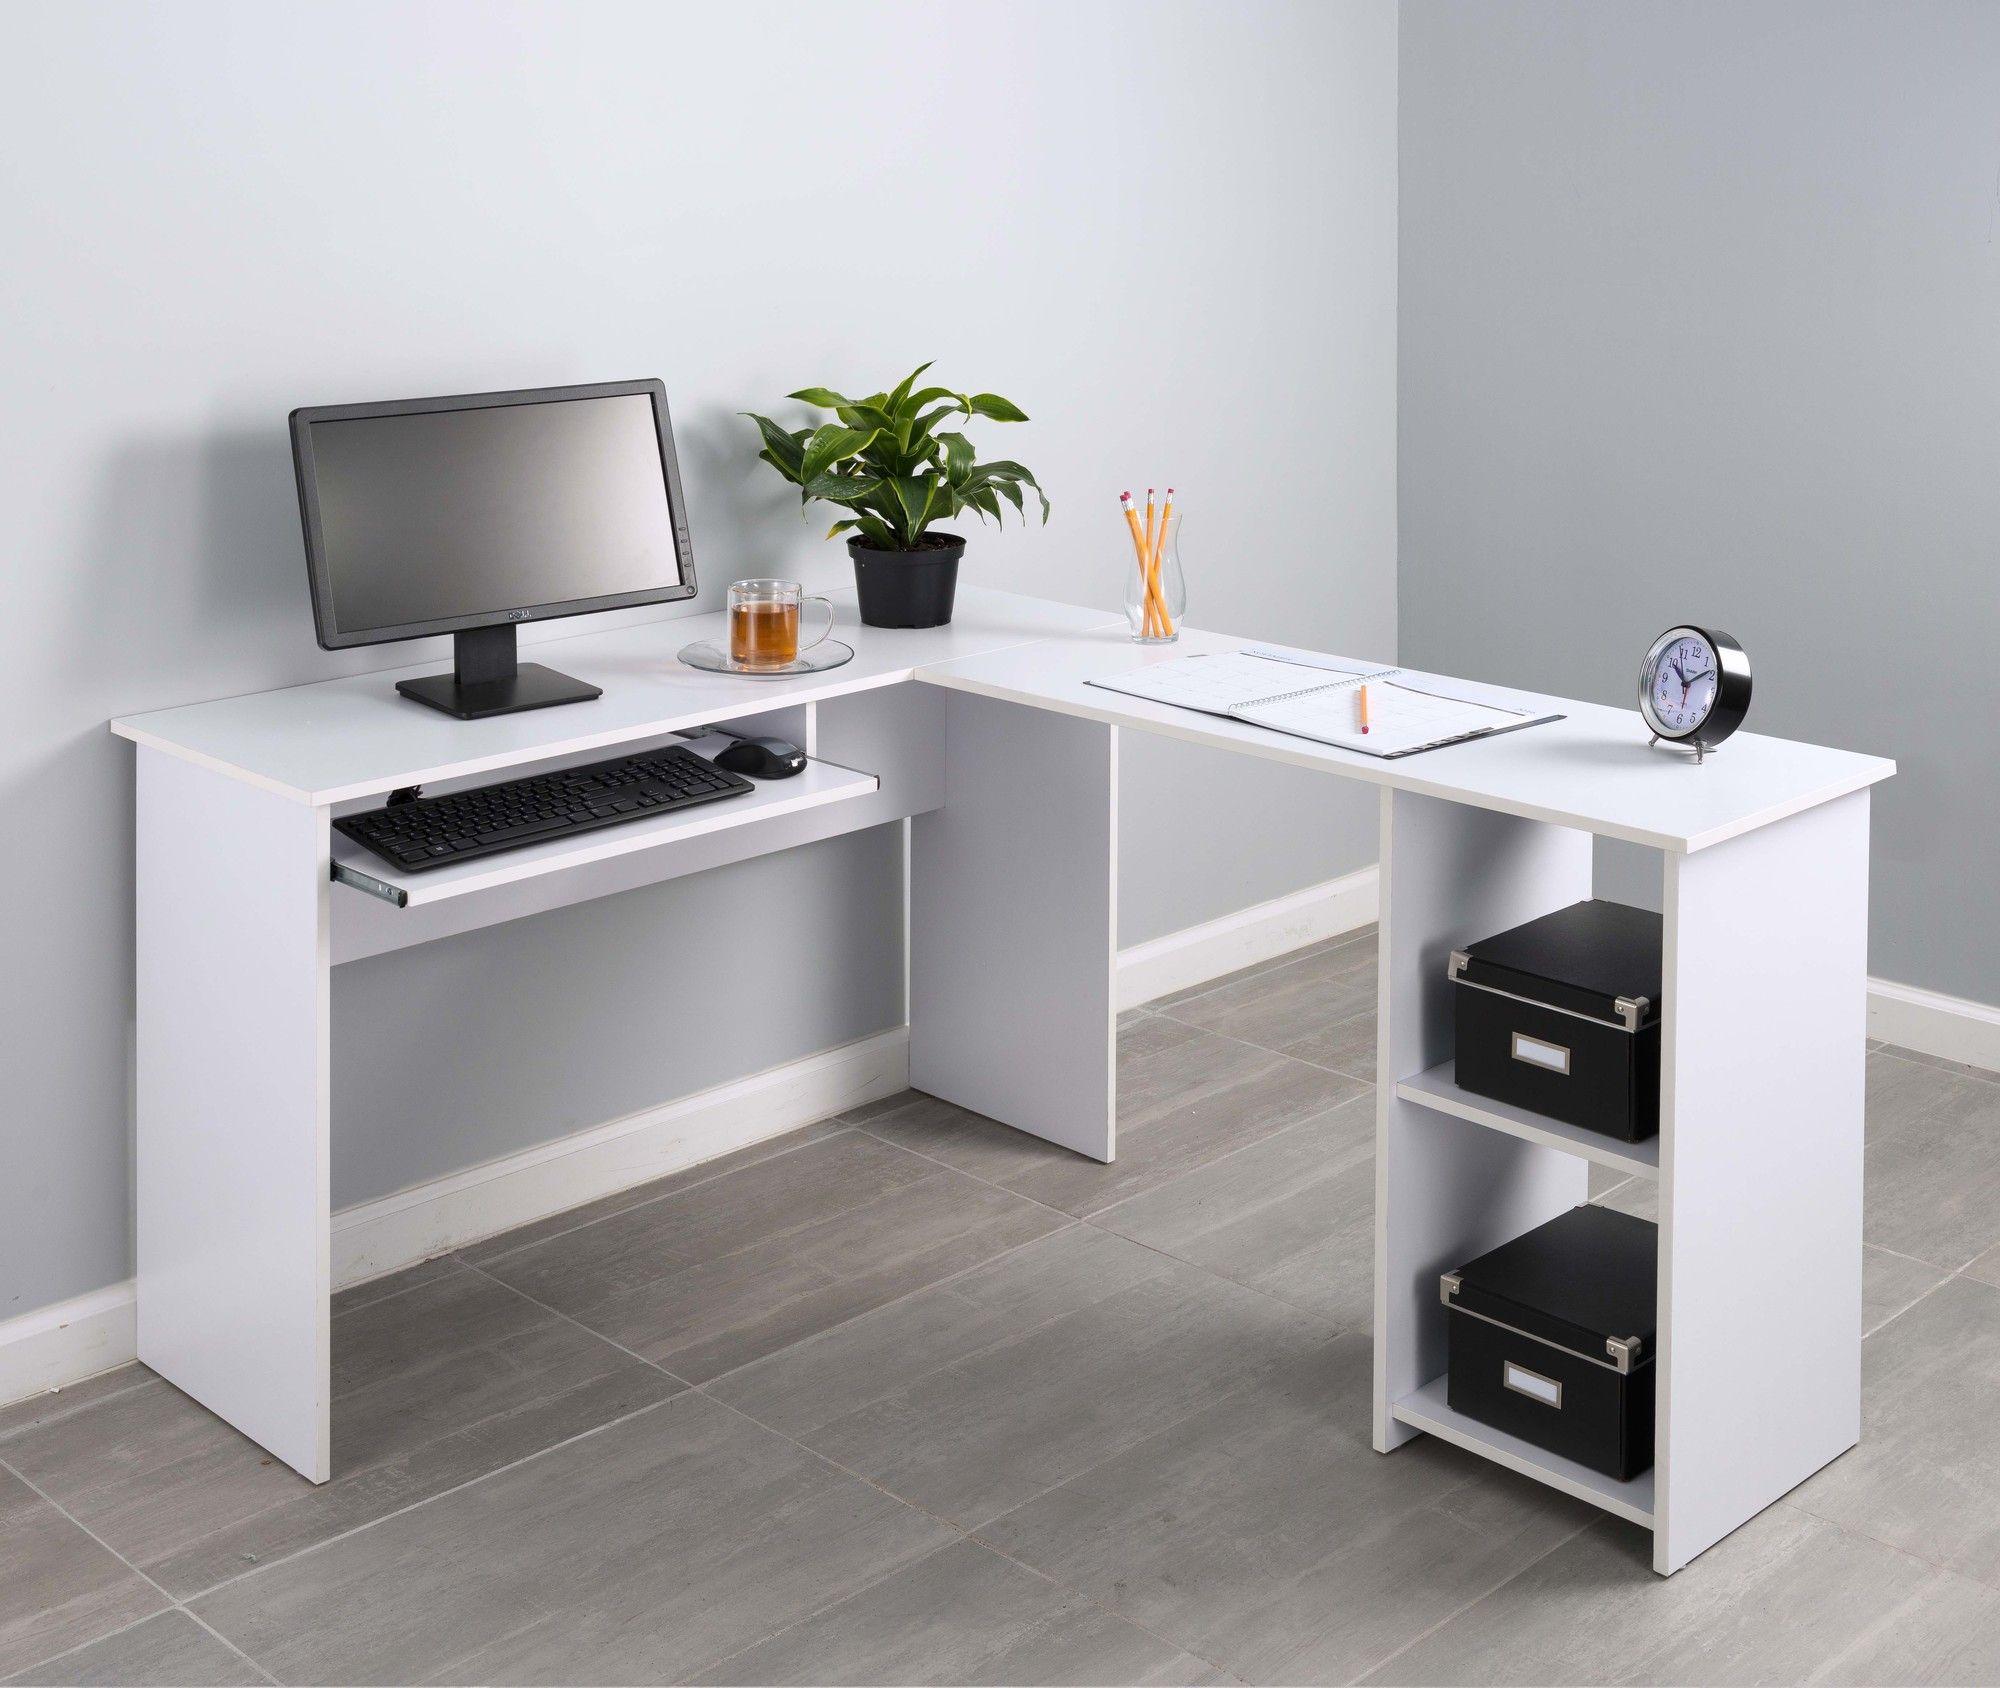 desk magnifier b l collection tuscany raw brown shaped computer desks bestar innova